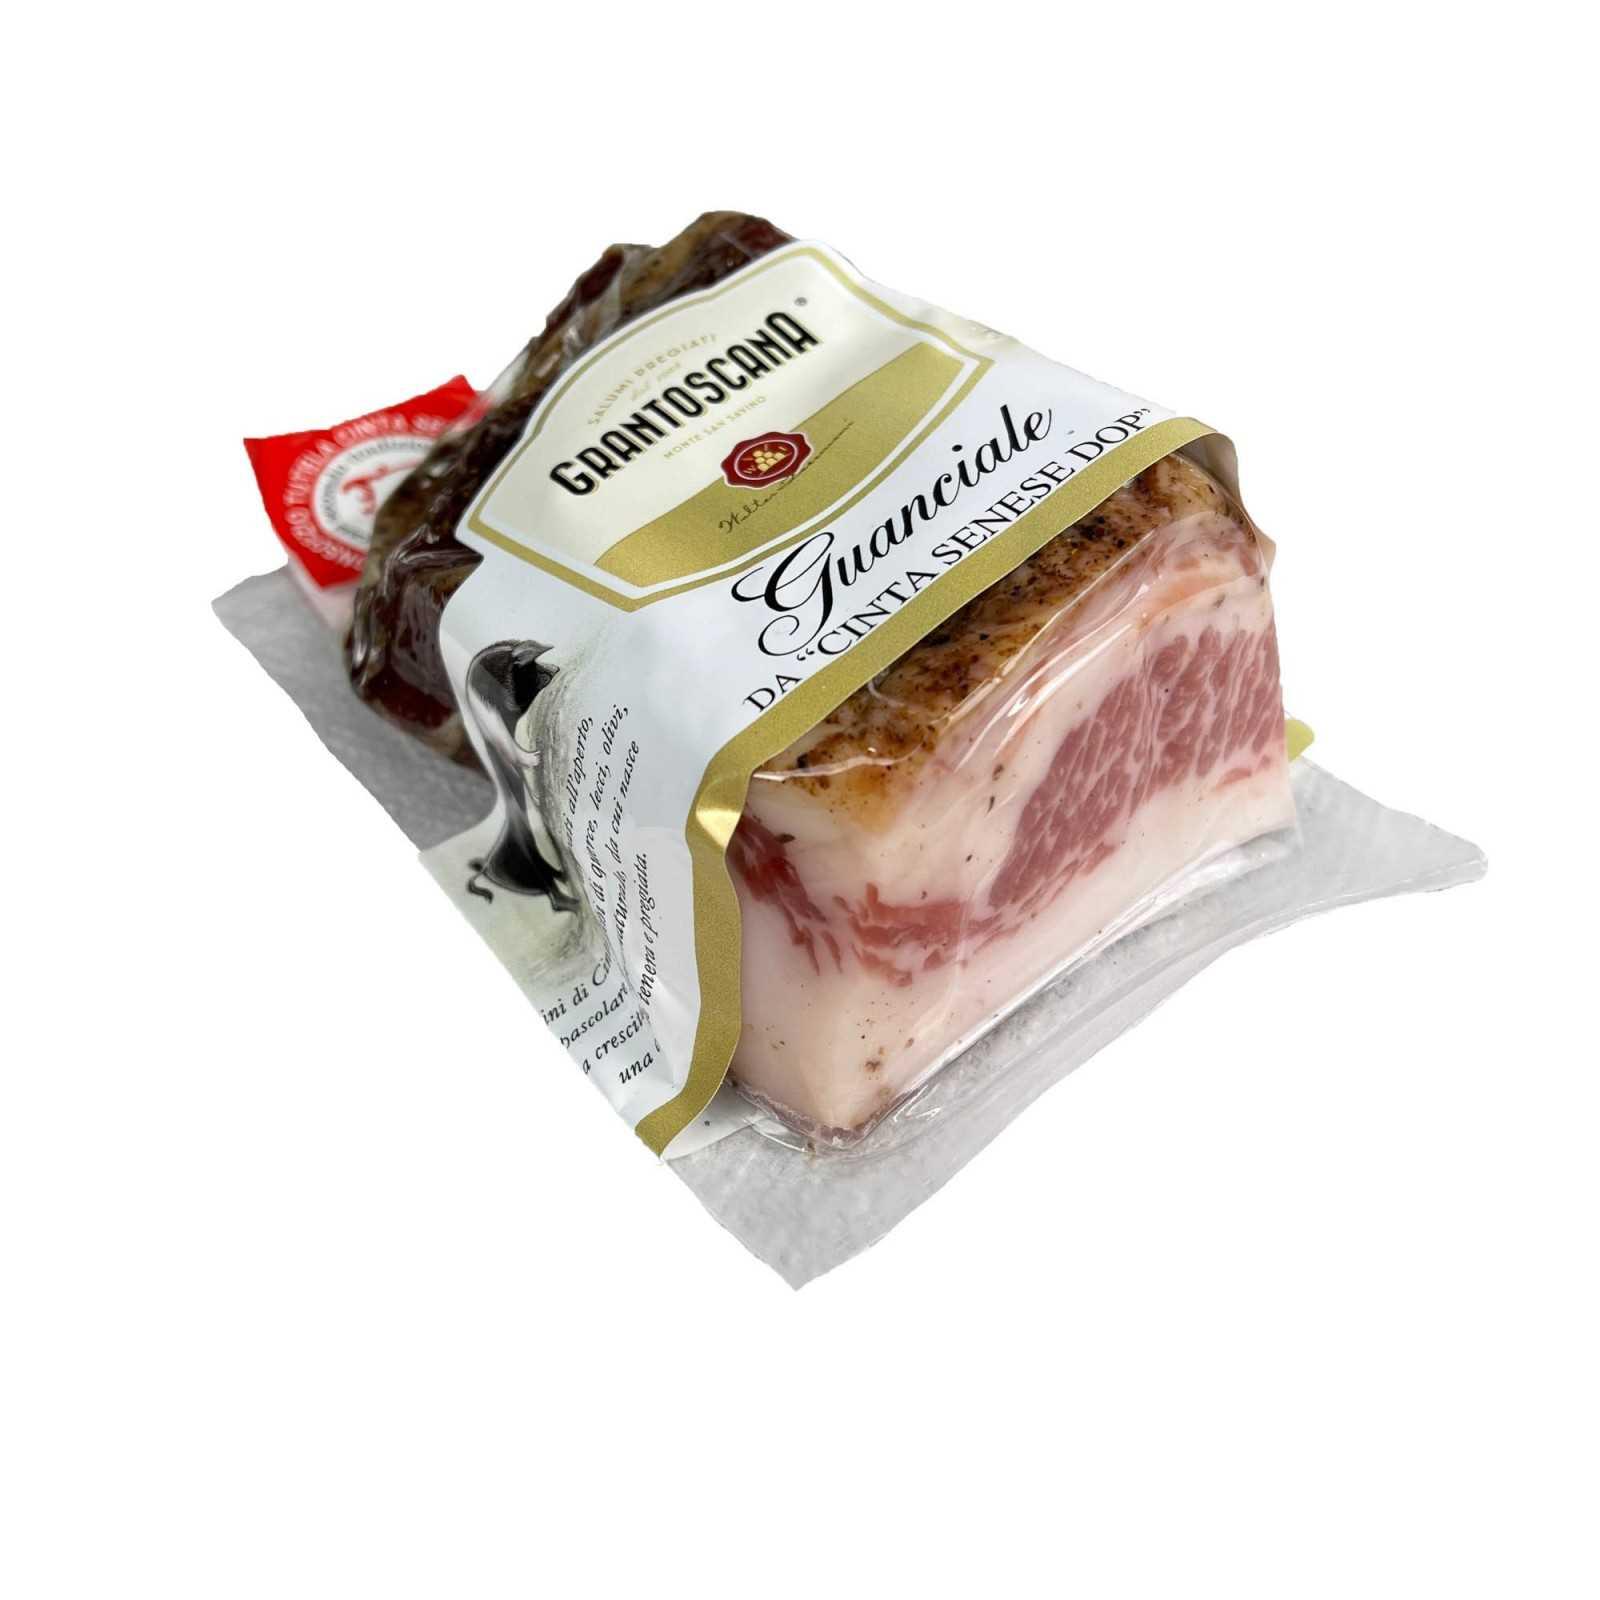 Cinta Senese PDO Tuscan Pork Jowl (Guanciale).